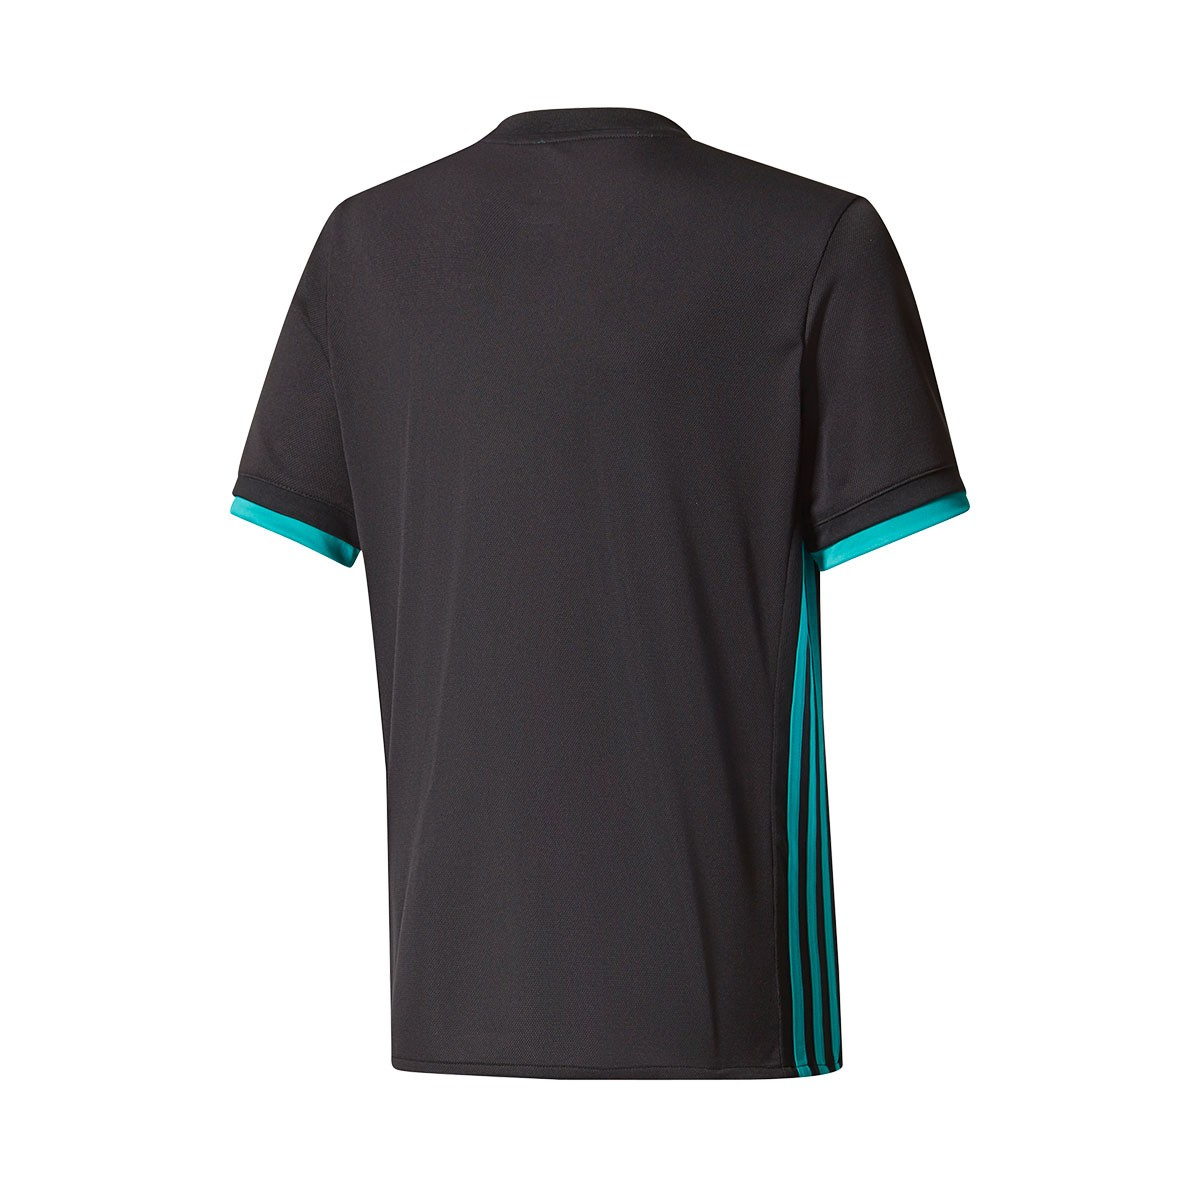 ... Camiseta Real Madrid Segunda Equipación 2017-2018 Niño Black-Aero reef.  CATEGORY d6508d25922a8